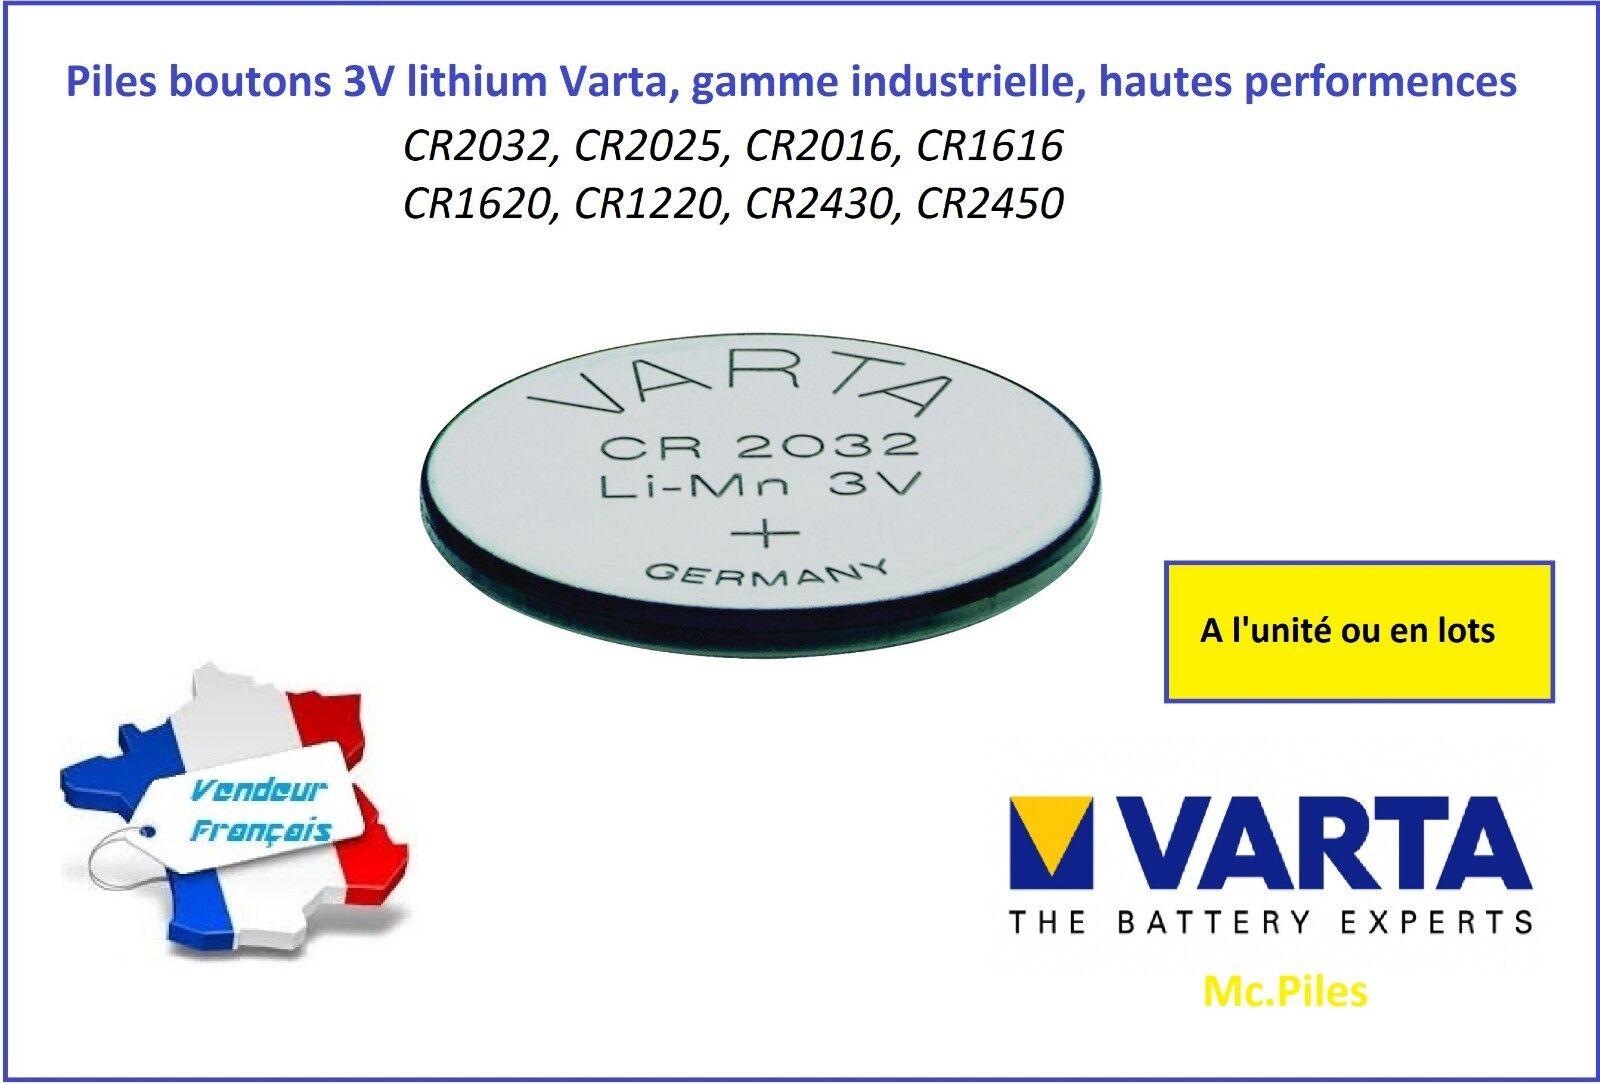 Knopfbatterien cr2032 3v Lithium Varta, Profi Kategorie hohe Leistung